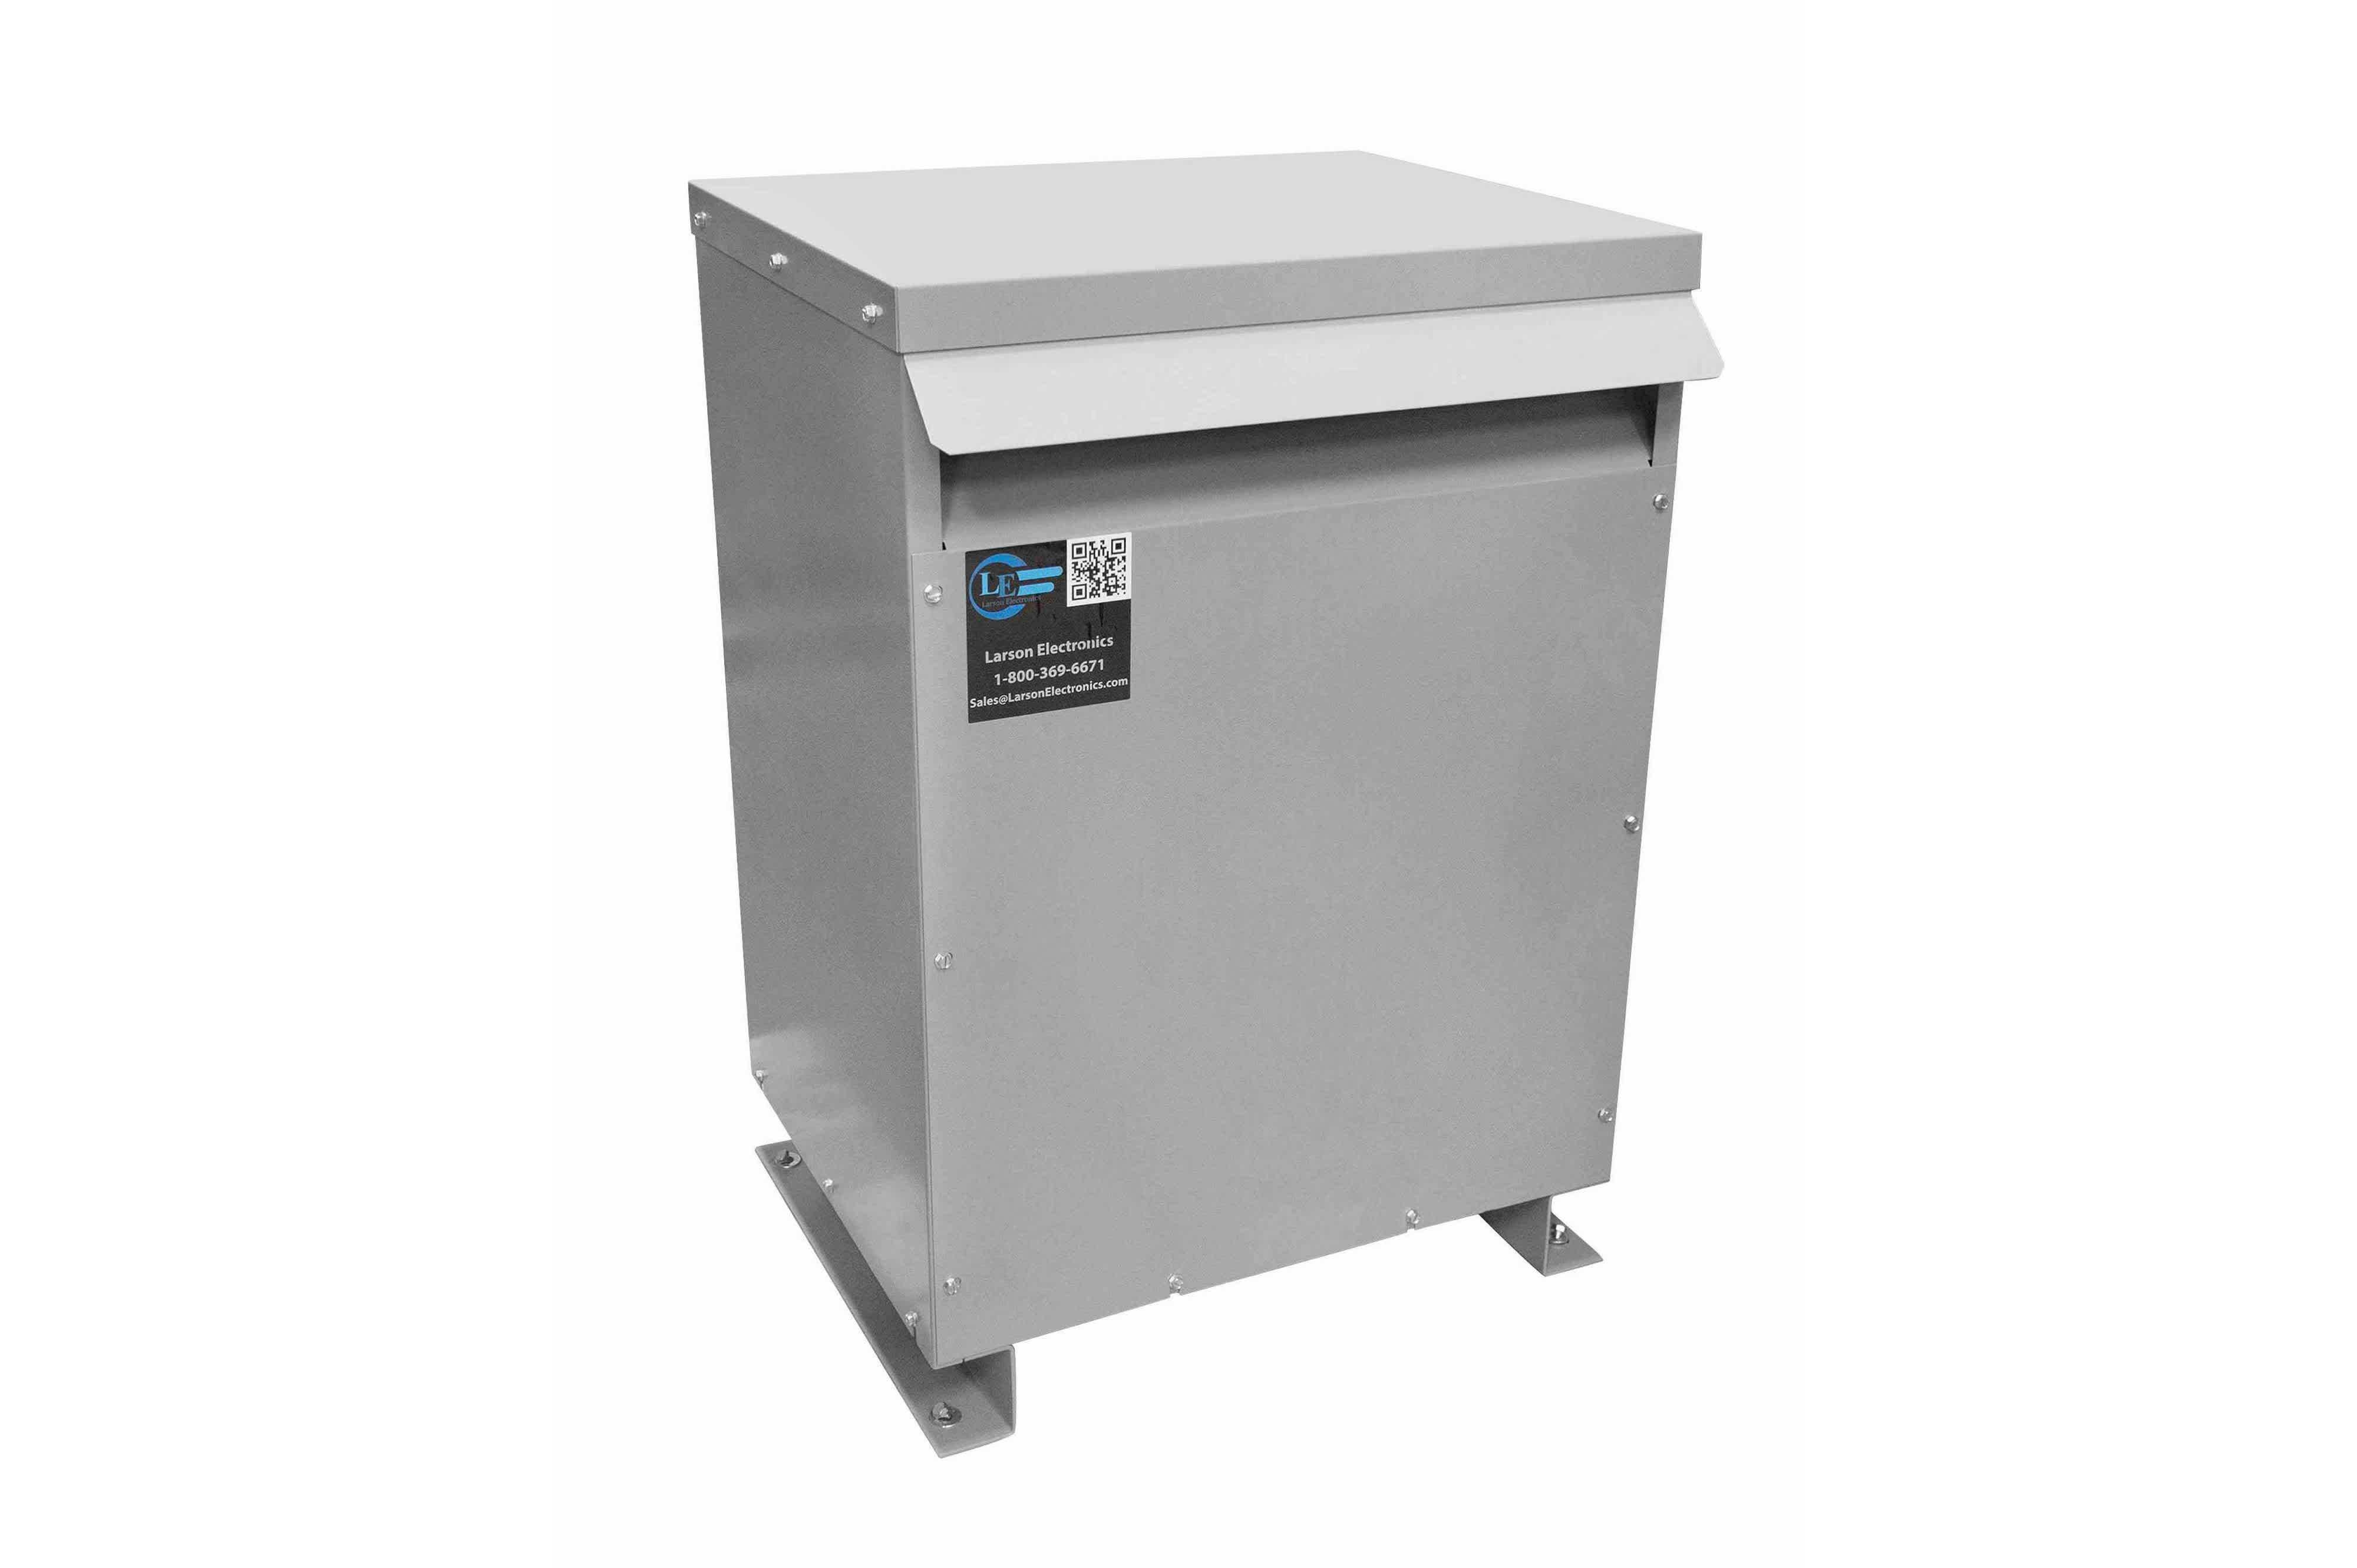 137.5 kVA 3PH Isolation Transformer, 415V Wye Primary, 208Y/120 Wye-N Secondary, N3R, Ventilated, 60 Hz